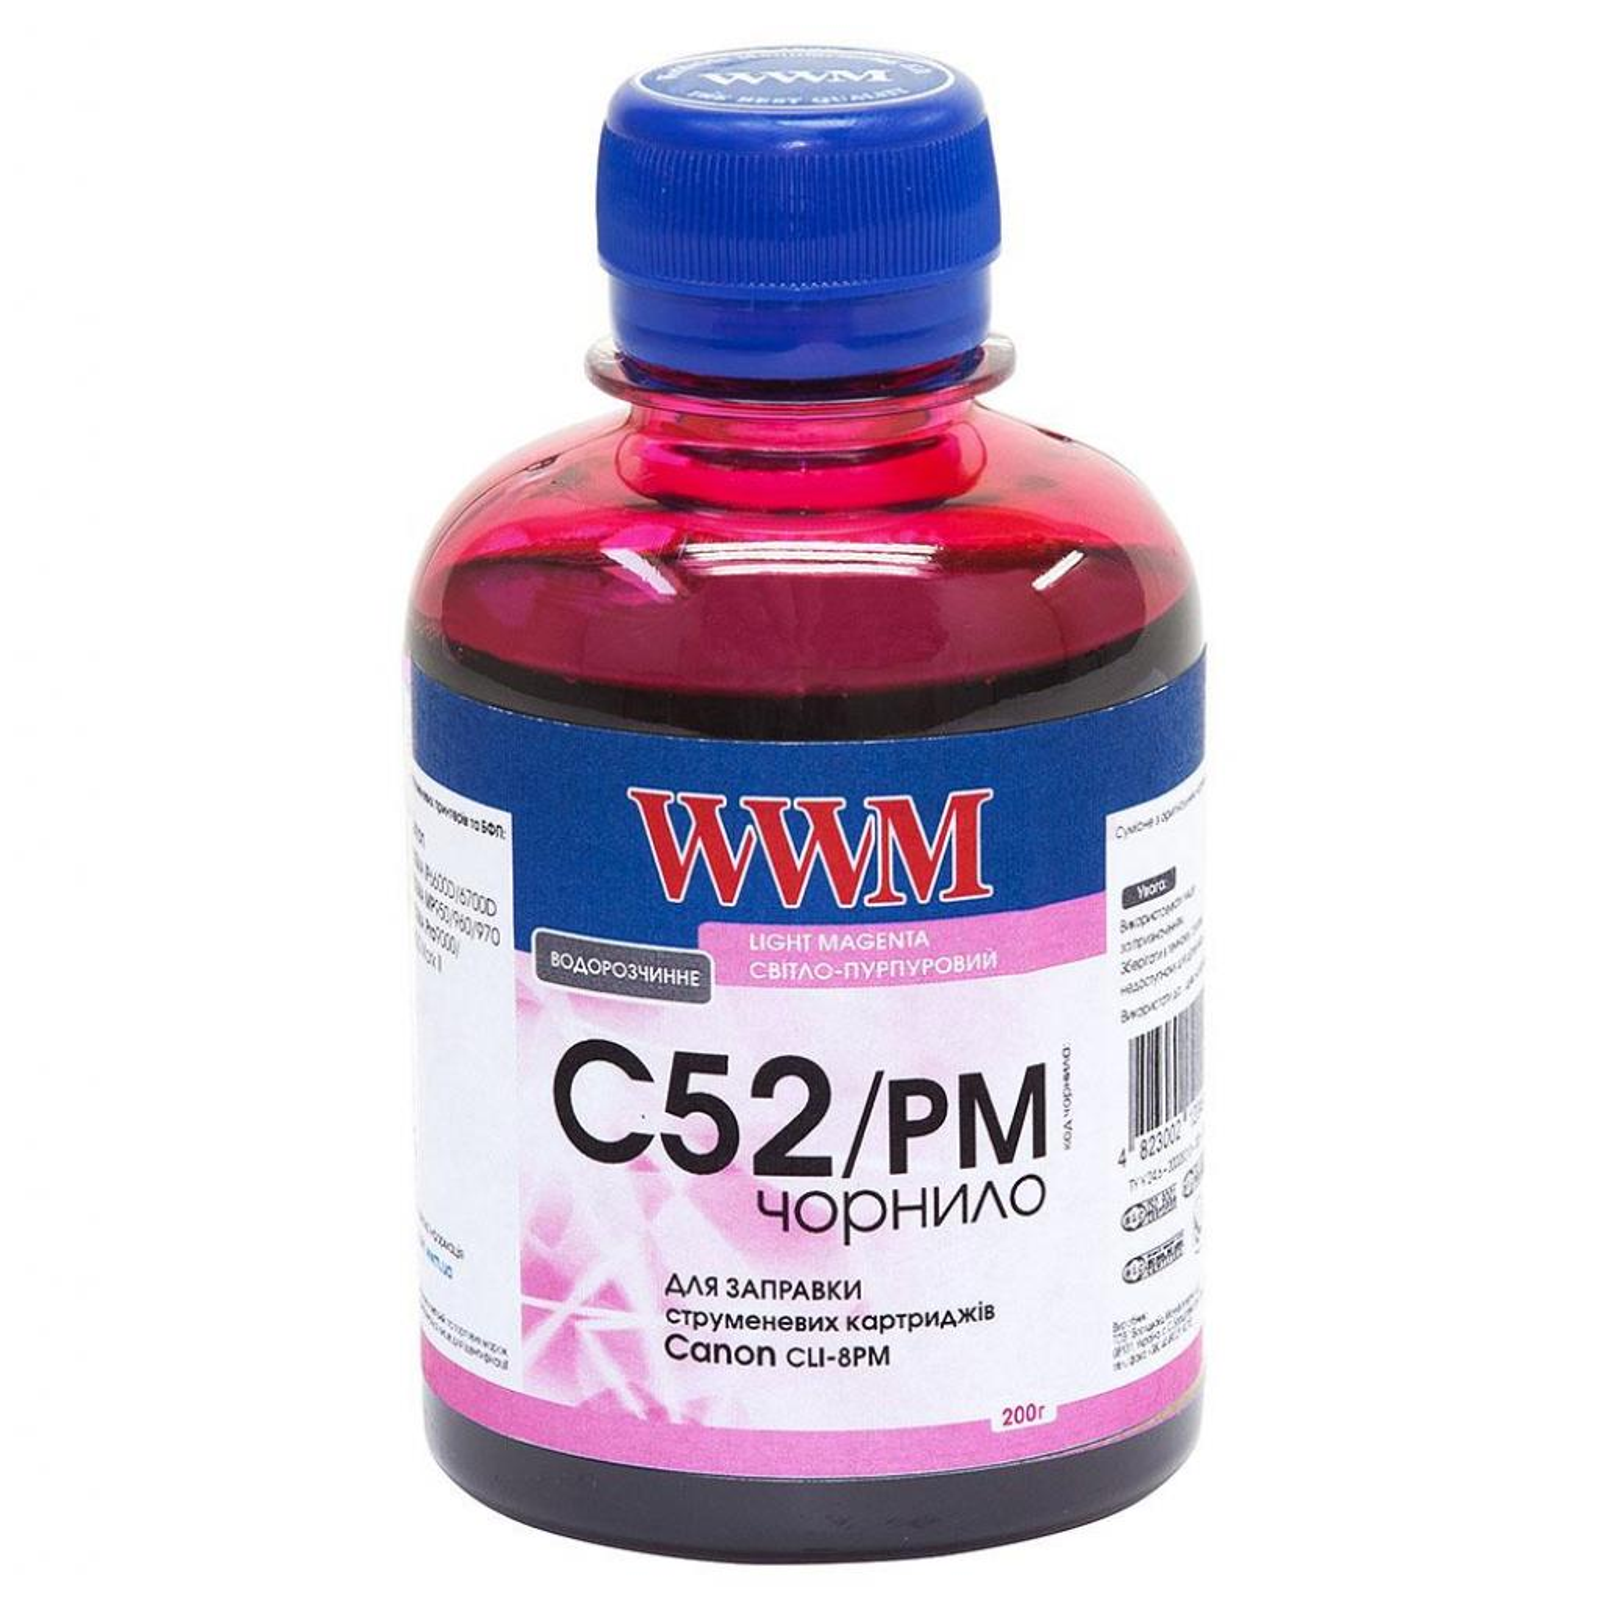 Чернила WWM CANON CL-52/CLI-8PC Photo (Magenta) (C52/PM)